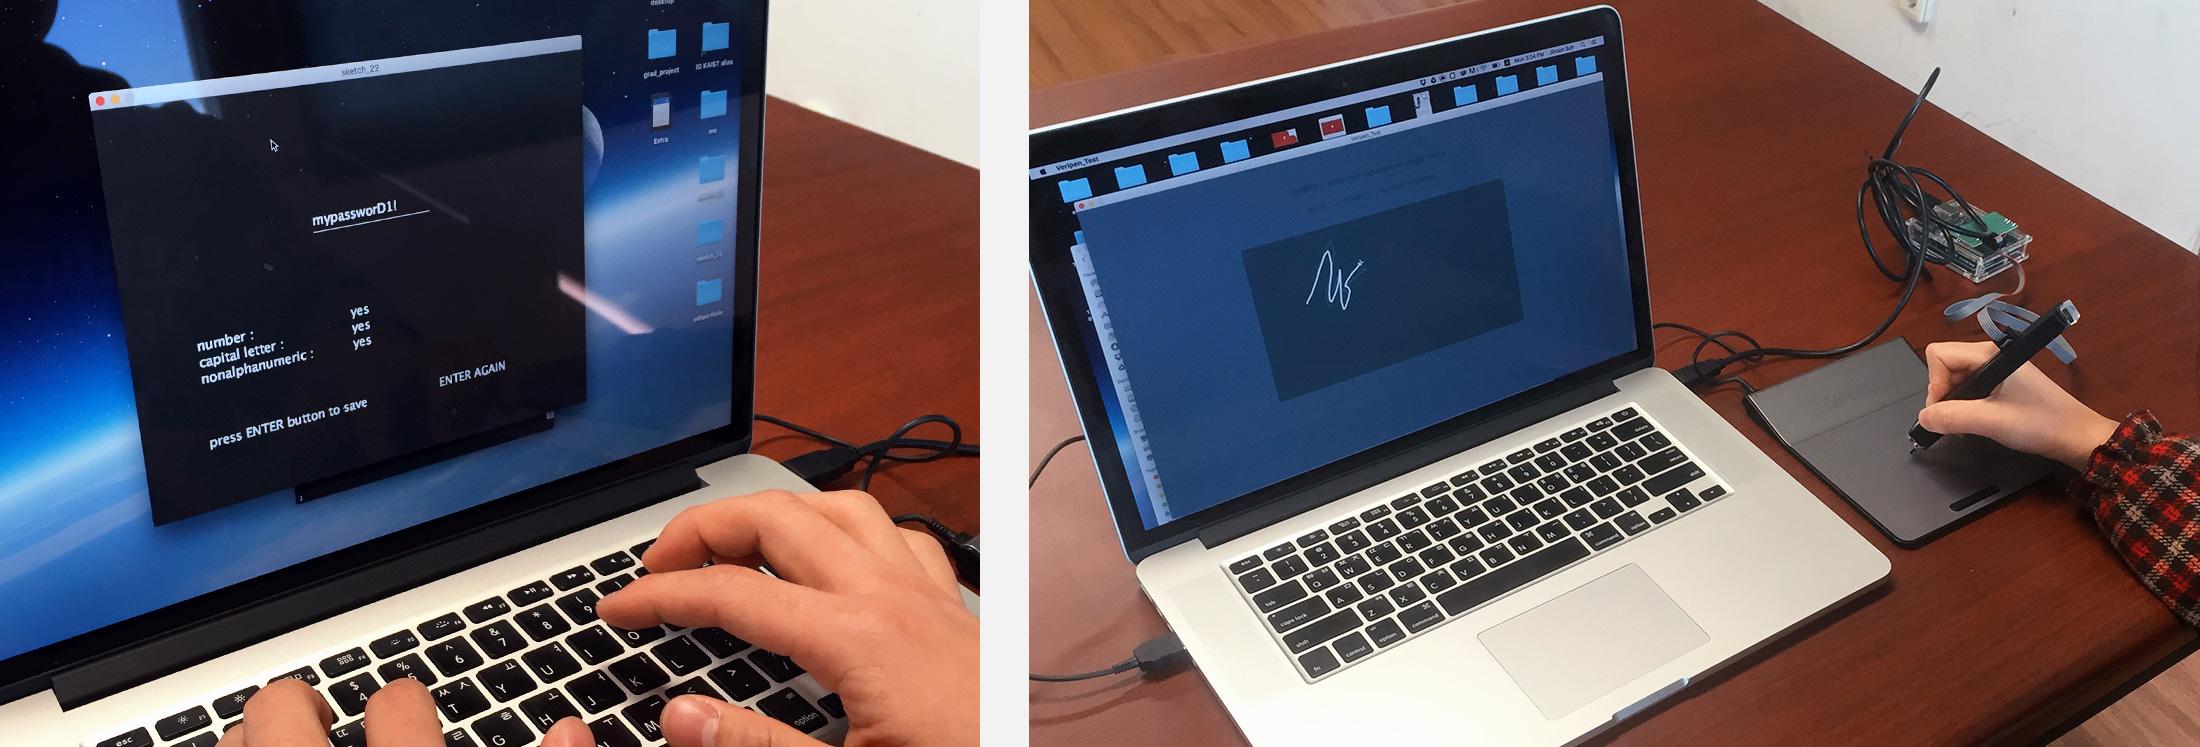 User simulating of regular password generation (left), user testing Veri-pen demo program (right)